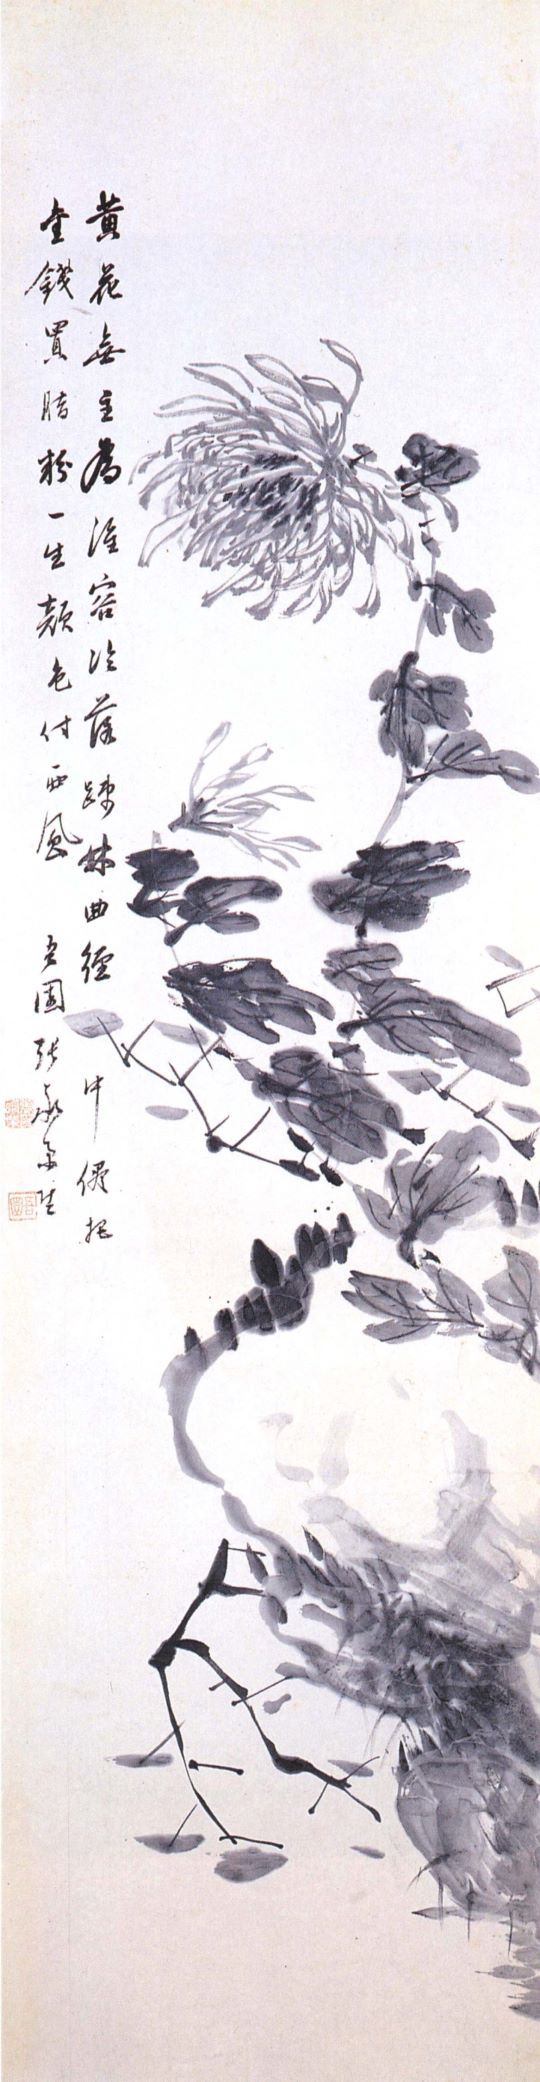 (Korea) Chrythethum of the Four Gentlemen by Jang Seung-eop (1843- 1897). ink on hanji.